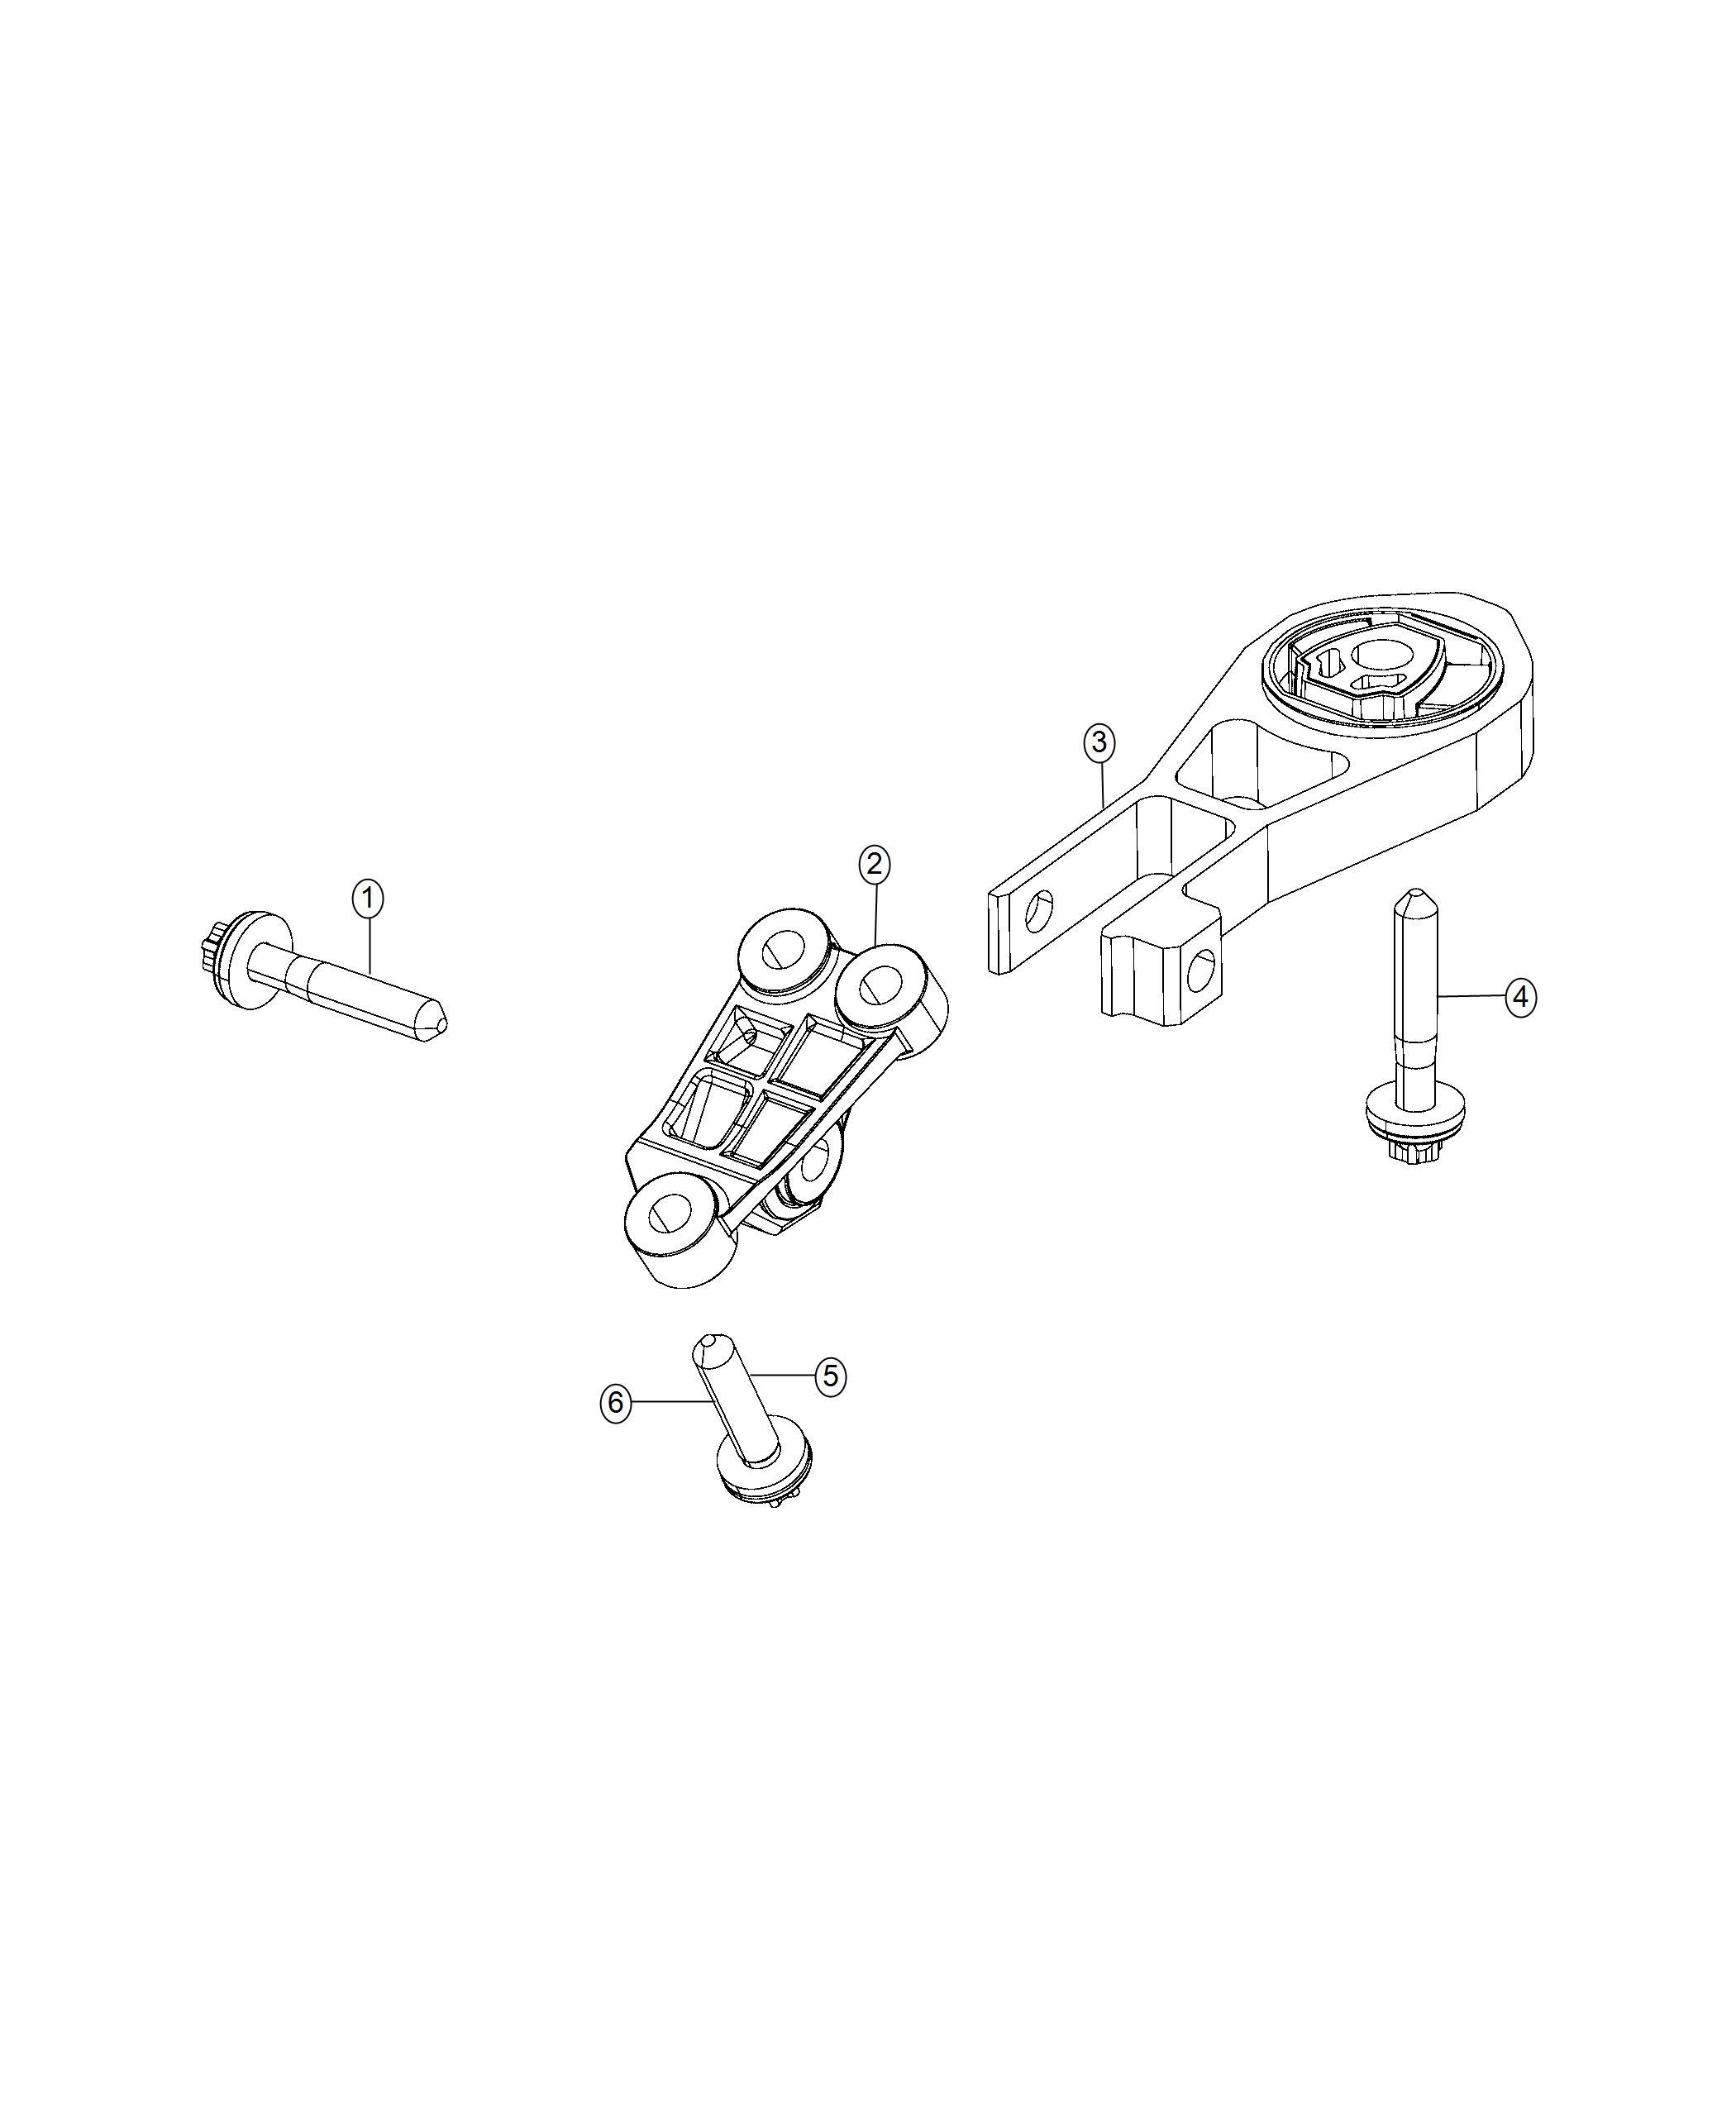 Jeep Compass Bracket Engine Mount Awd Auto Fwd